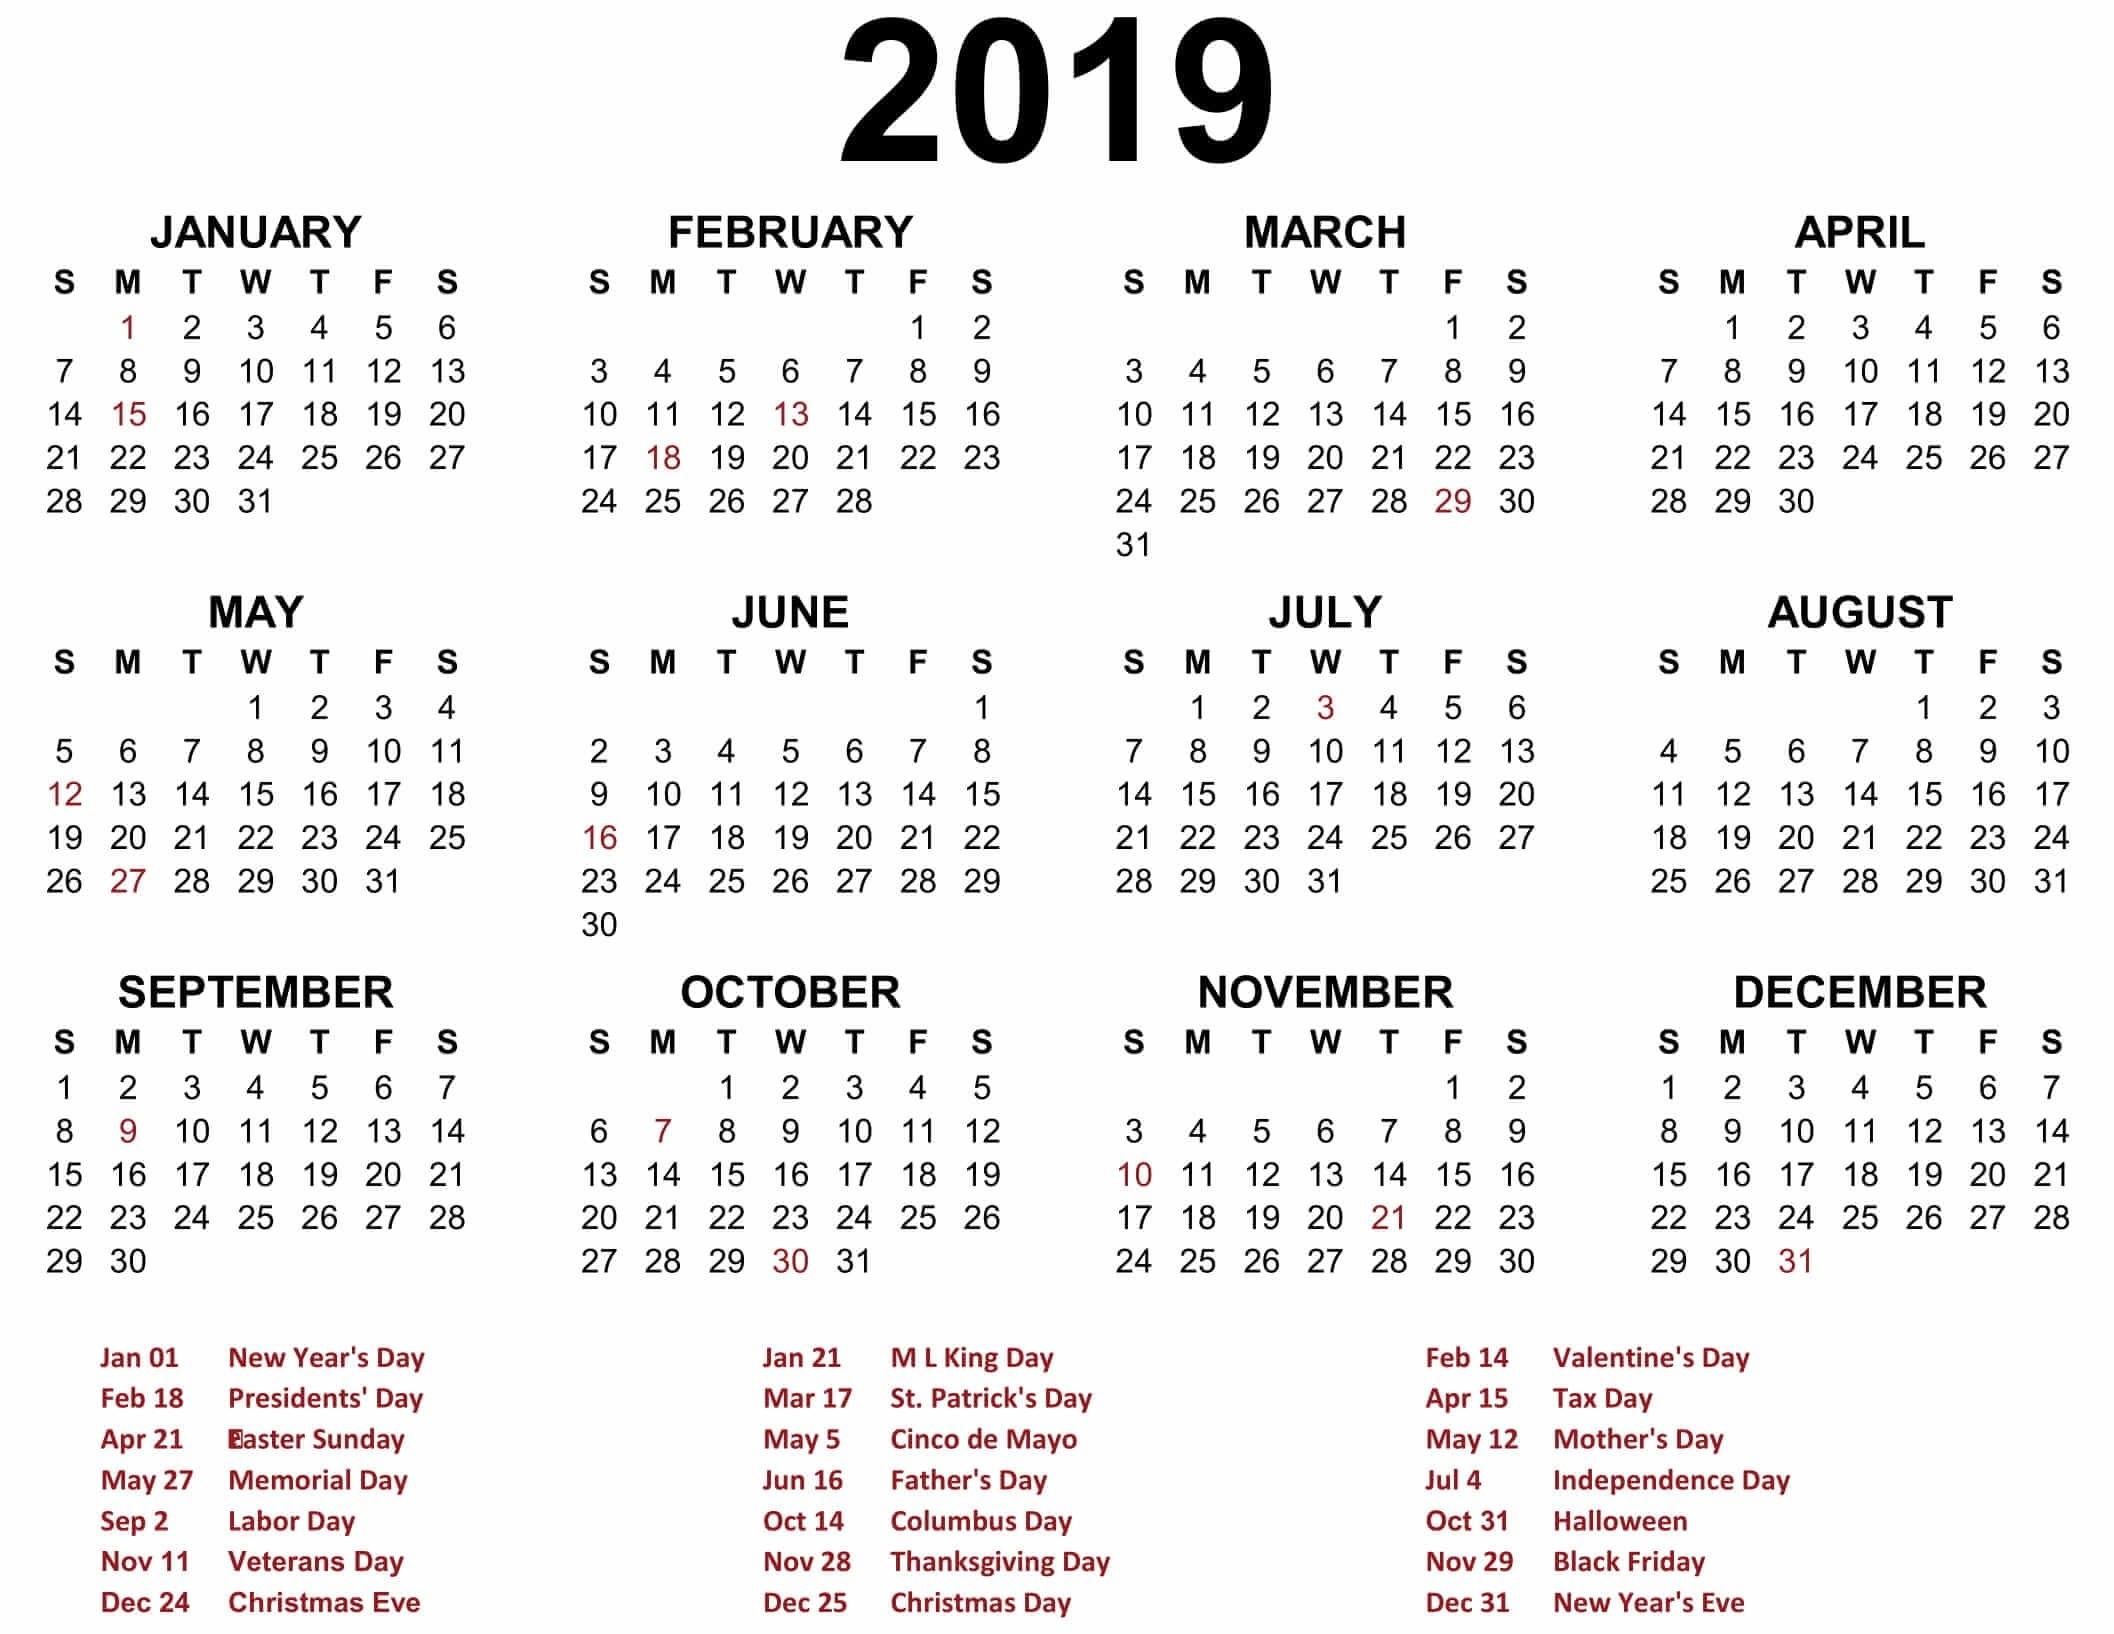 Printable Blank 2019 Calendar Templates - Calenndar Calendar 2019 Photo